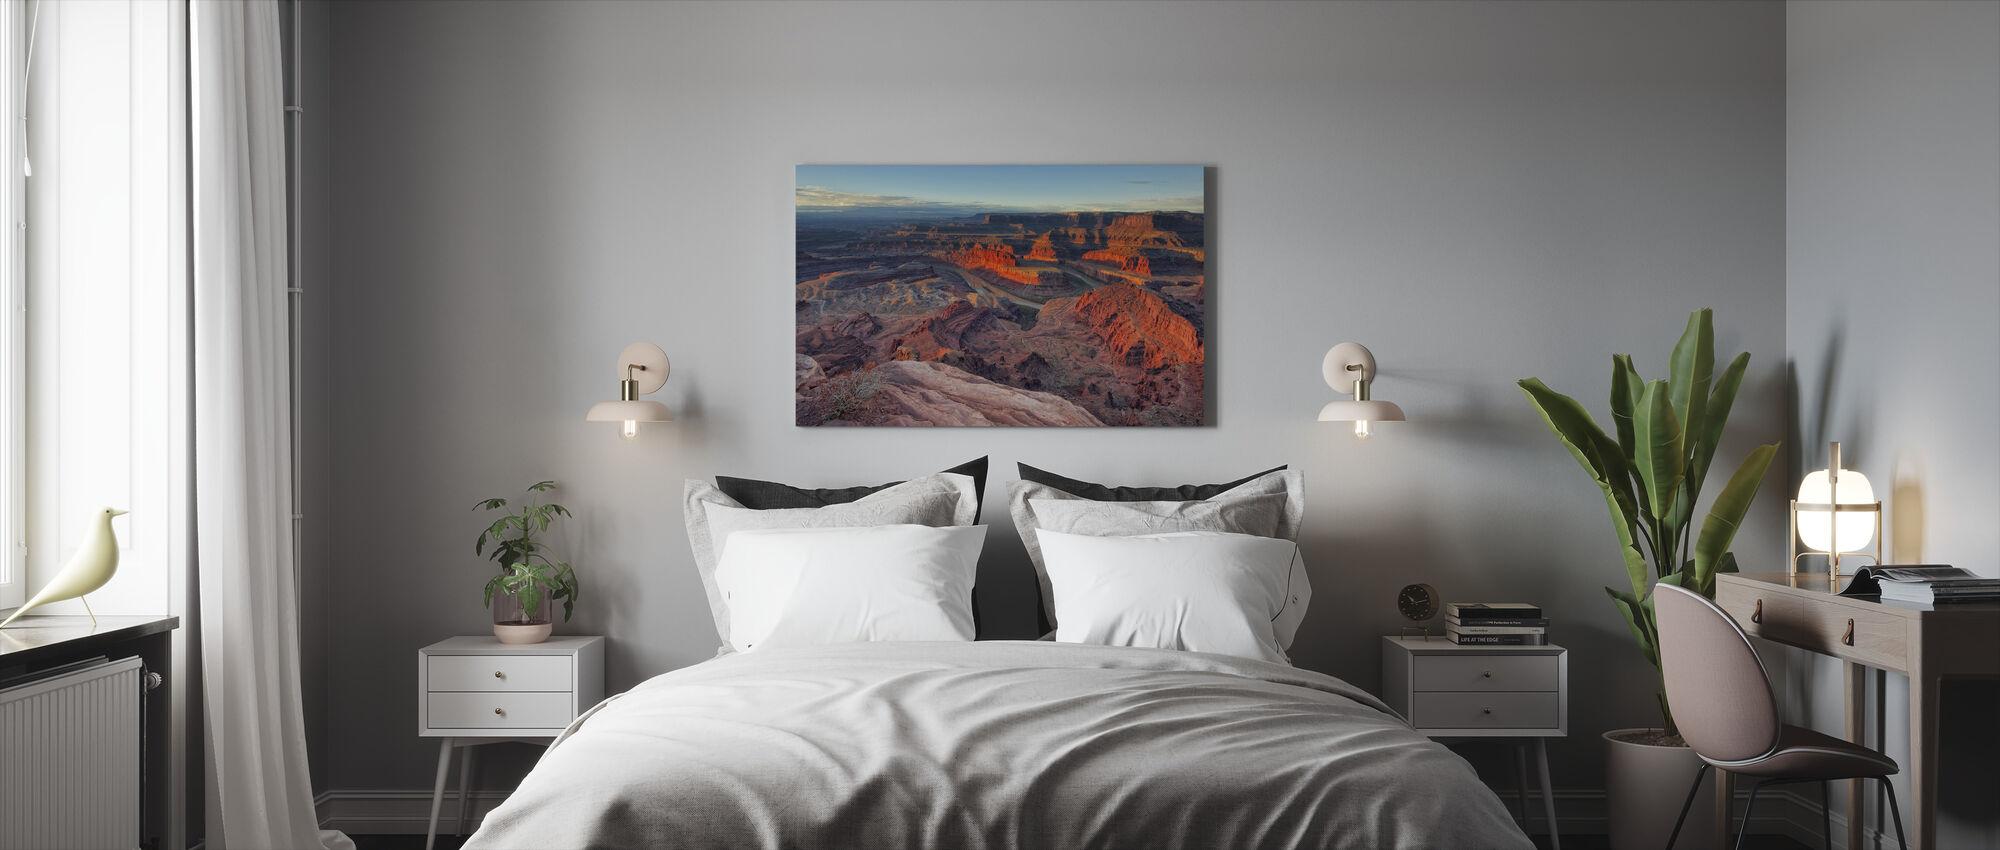 Dode Paard Punt - Canvas print - Slaapkamer